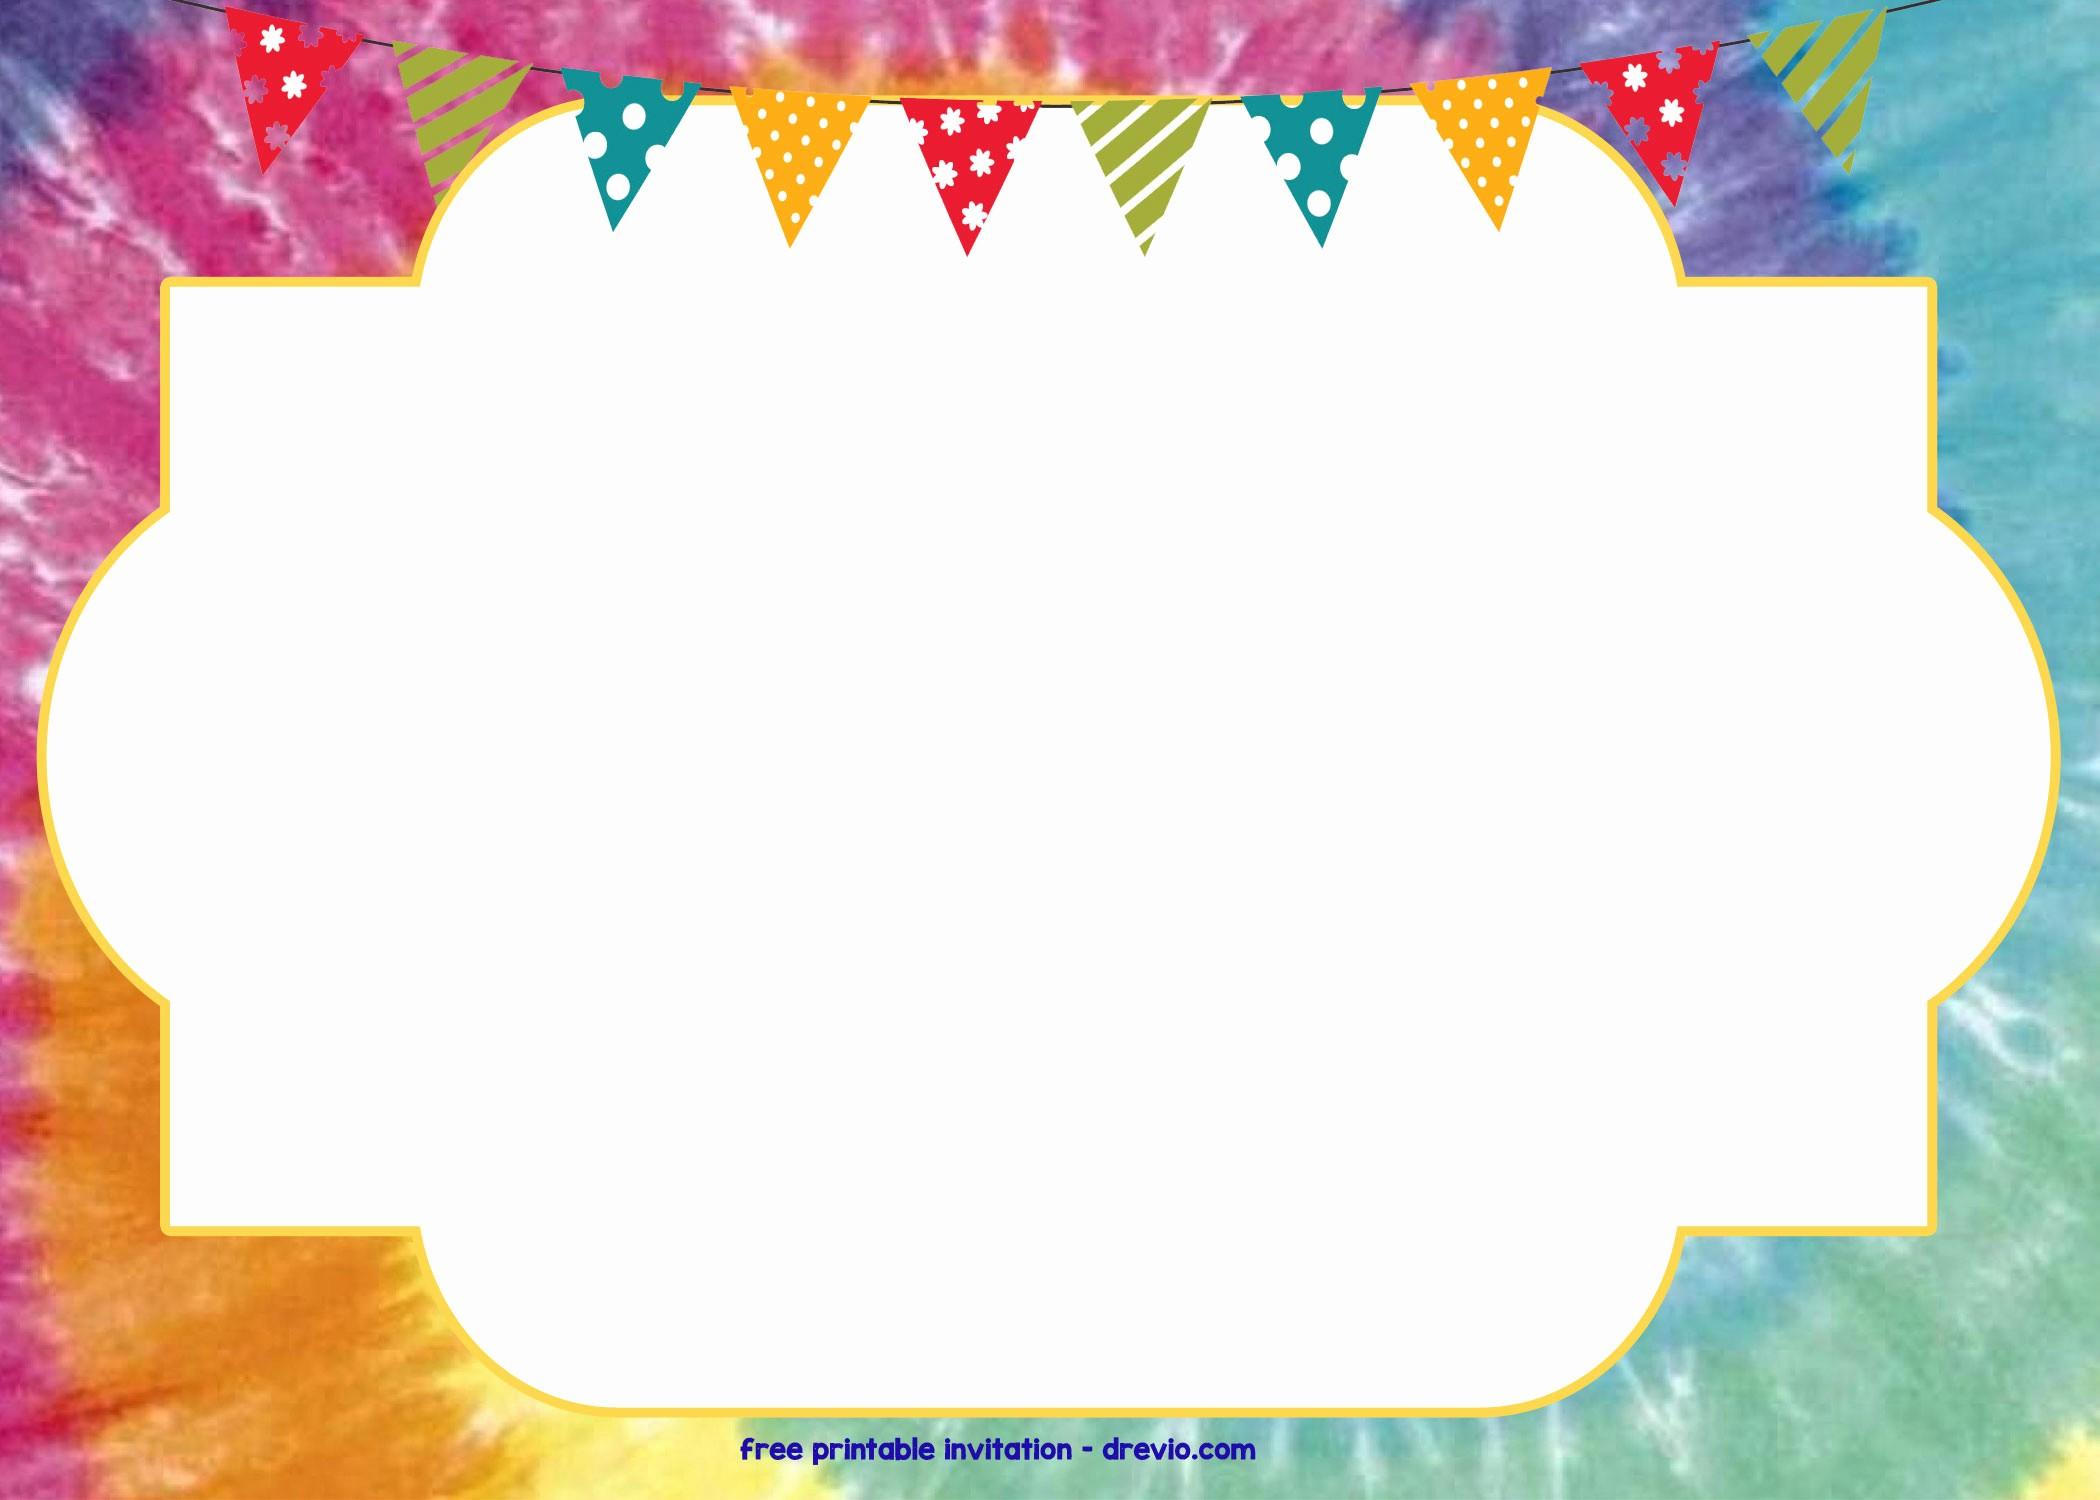 Tie Dye Party Invitations Printable Luxury Free Tie Dye Invitation Template